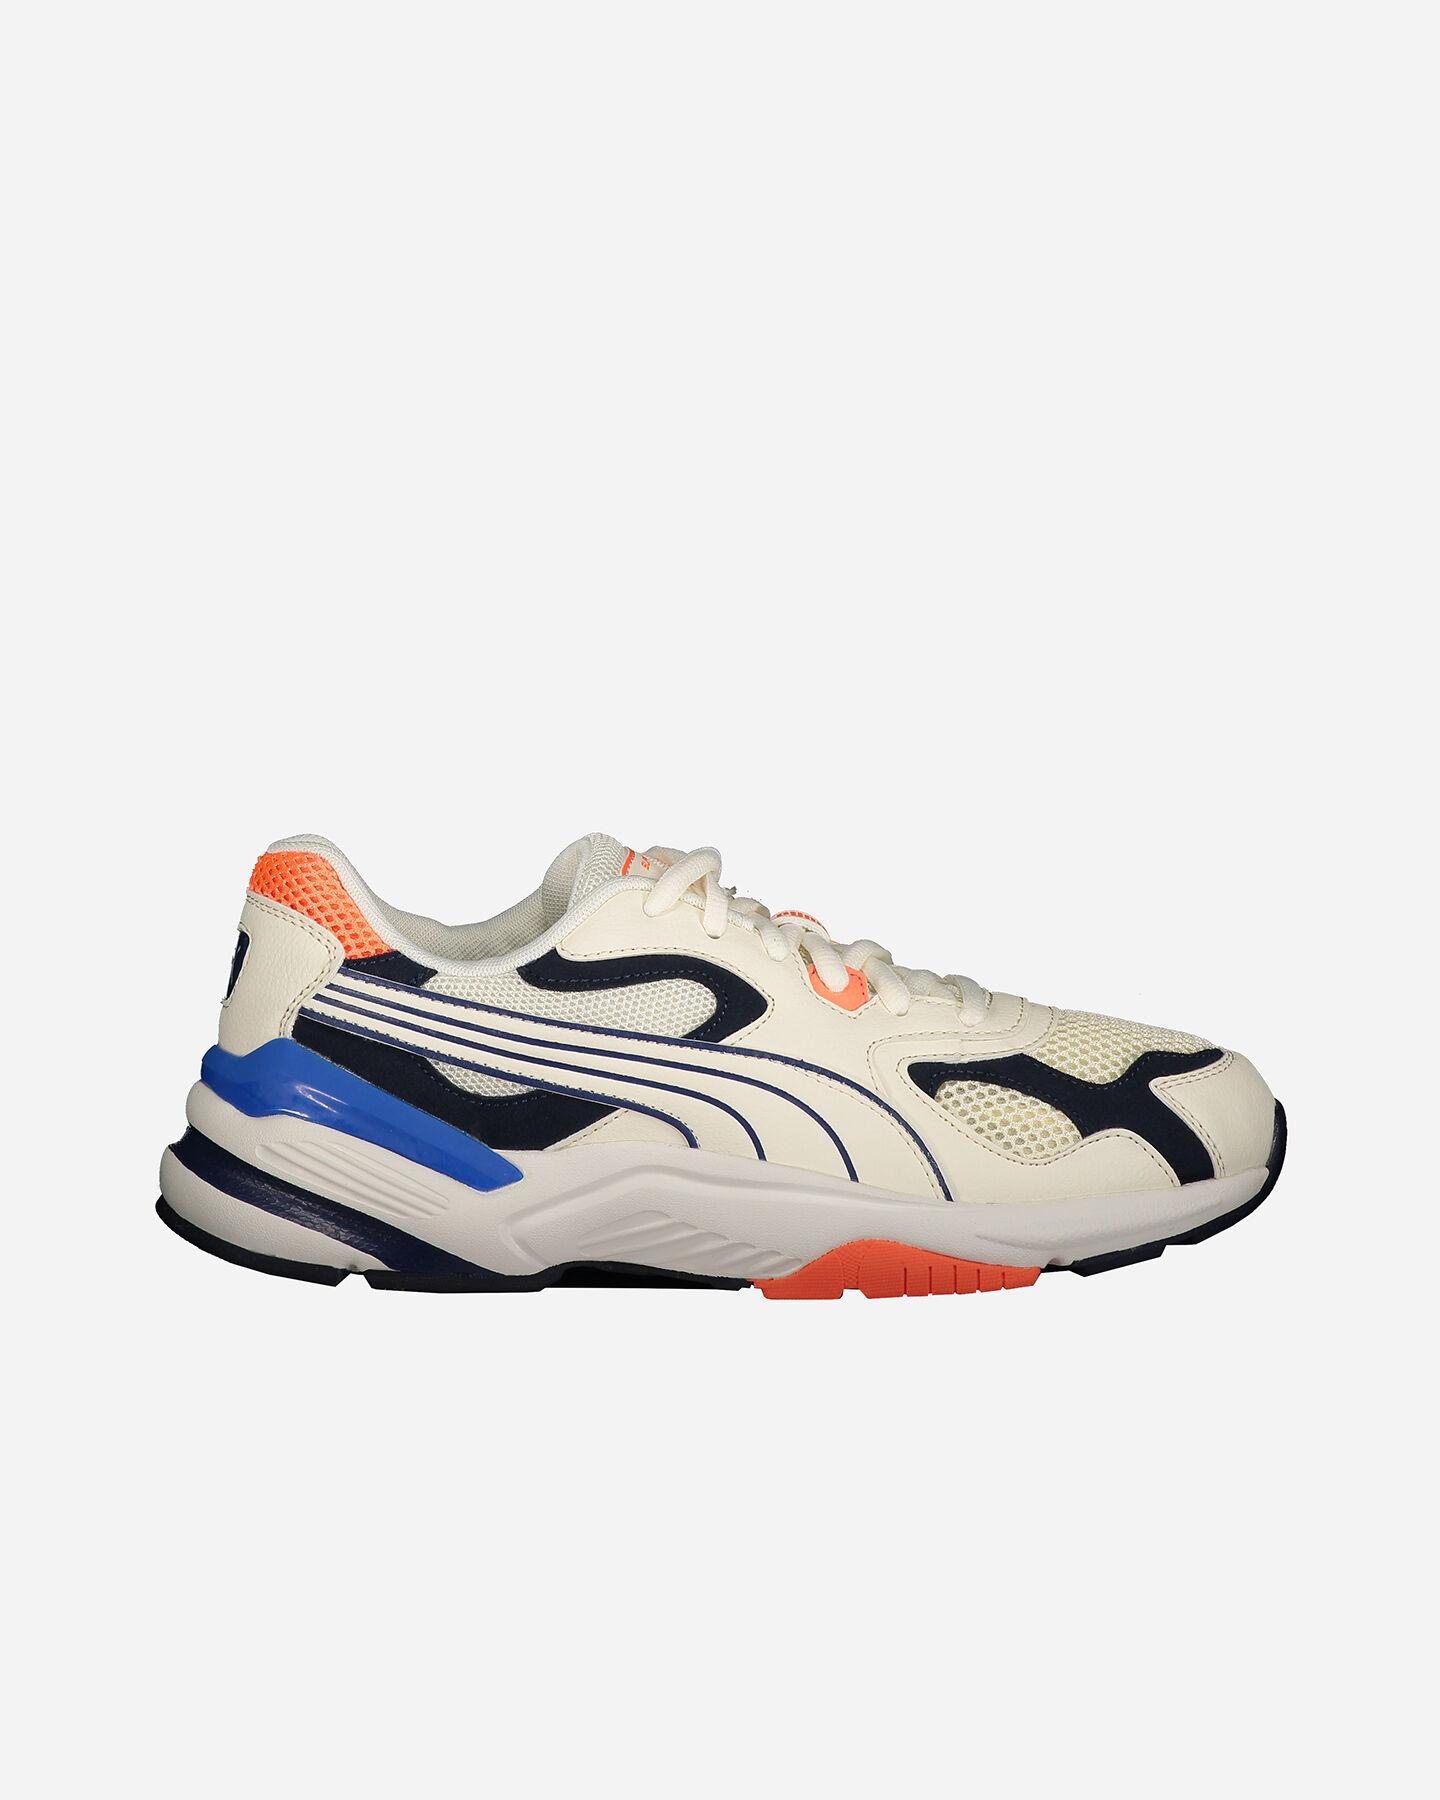 Scarpe uomo: sneakers, ciabatte, scarponi, ciaspole